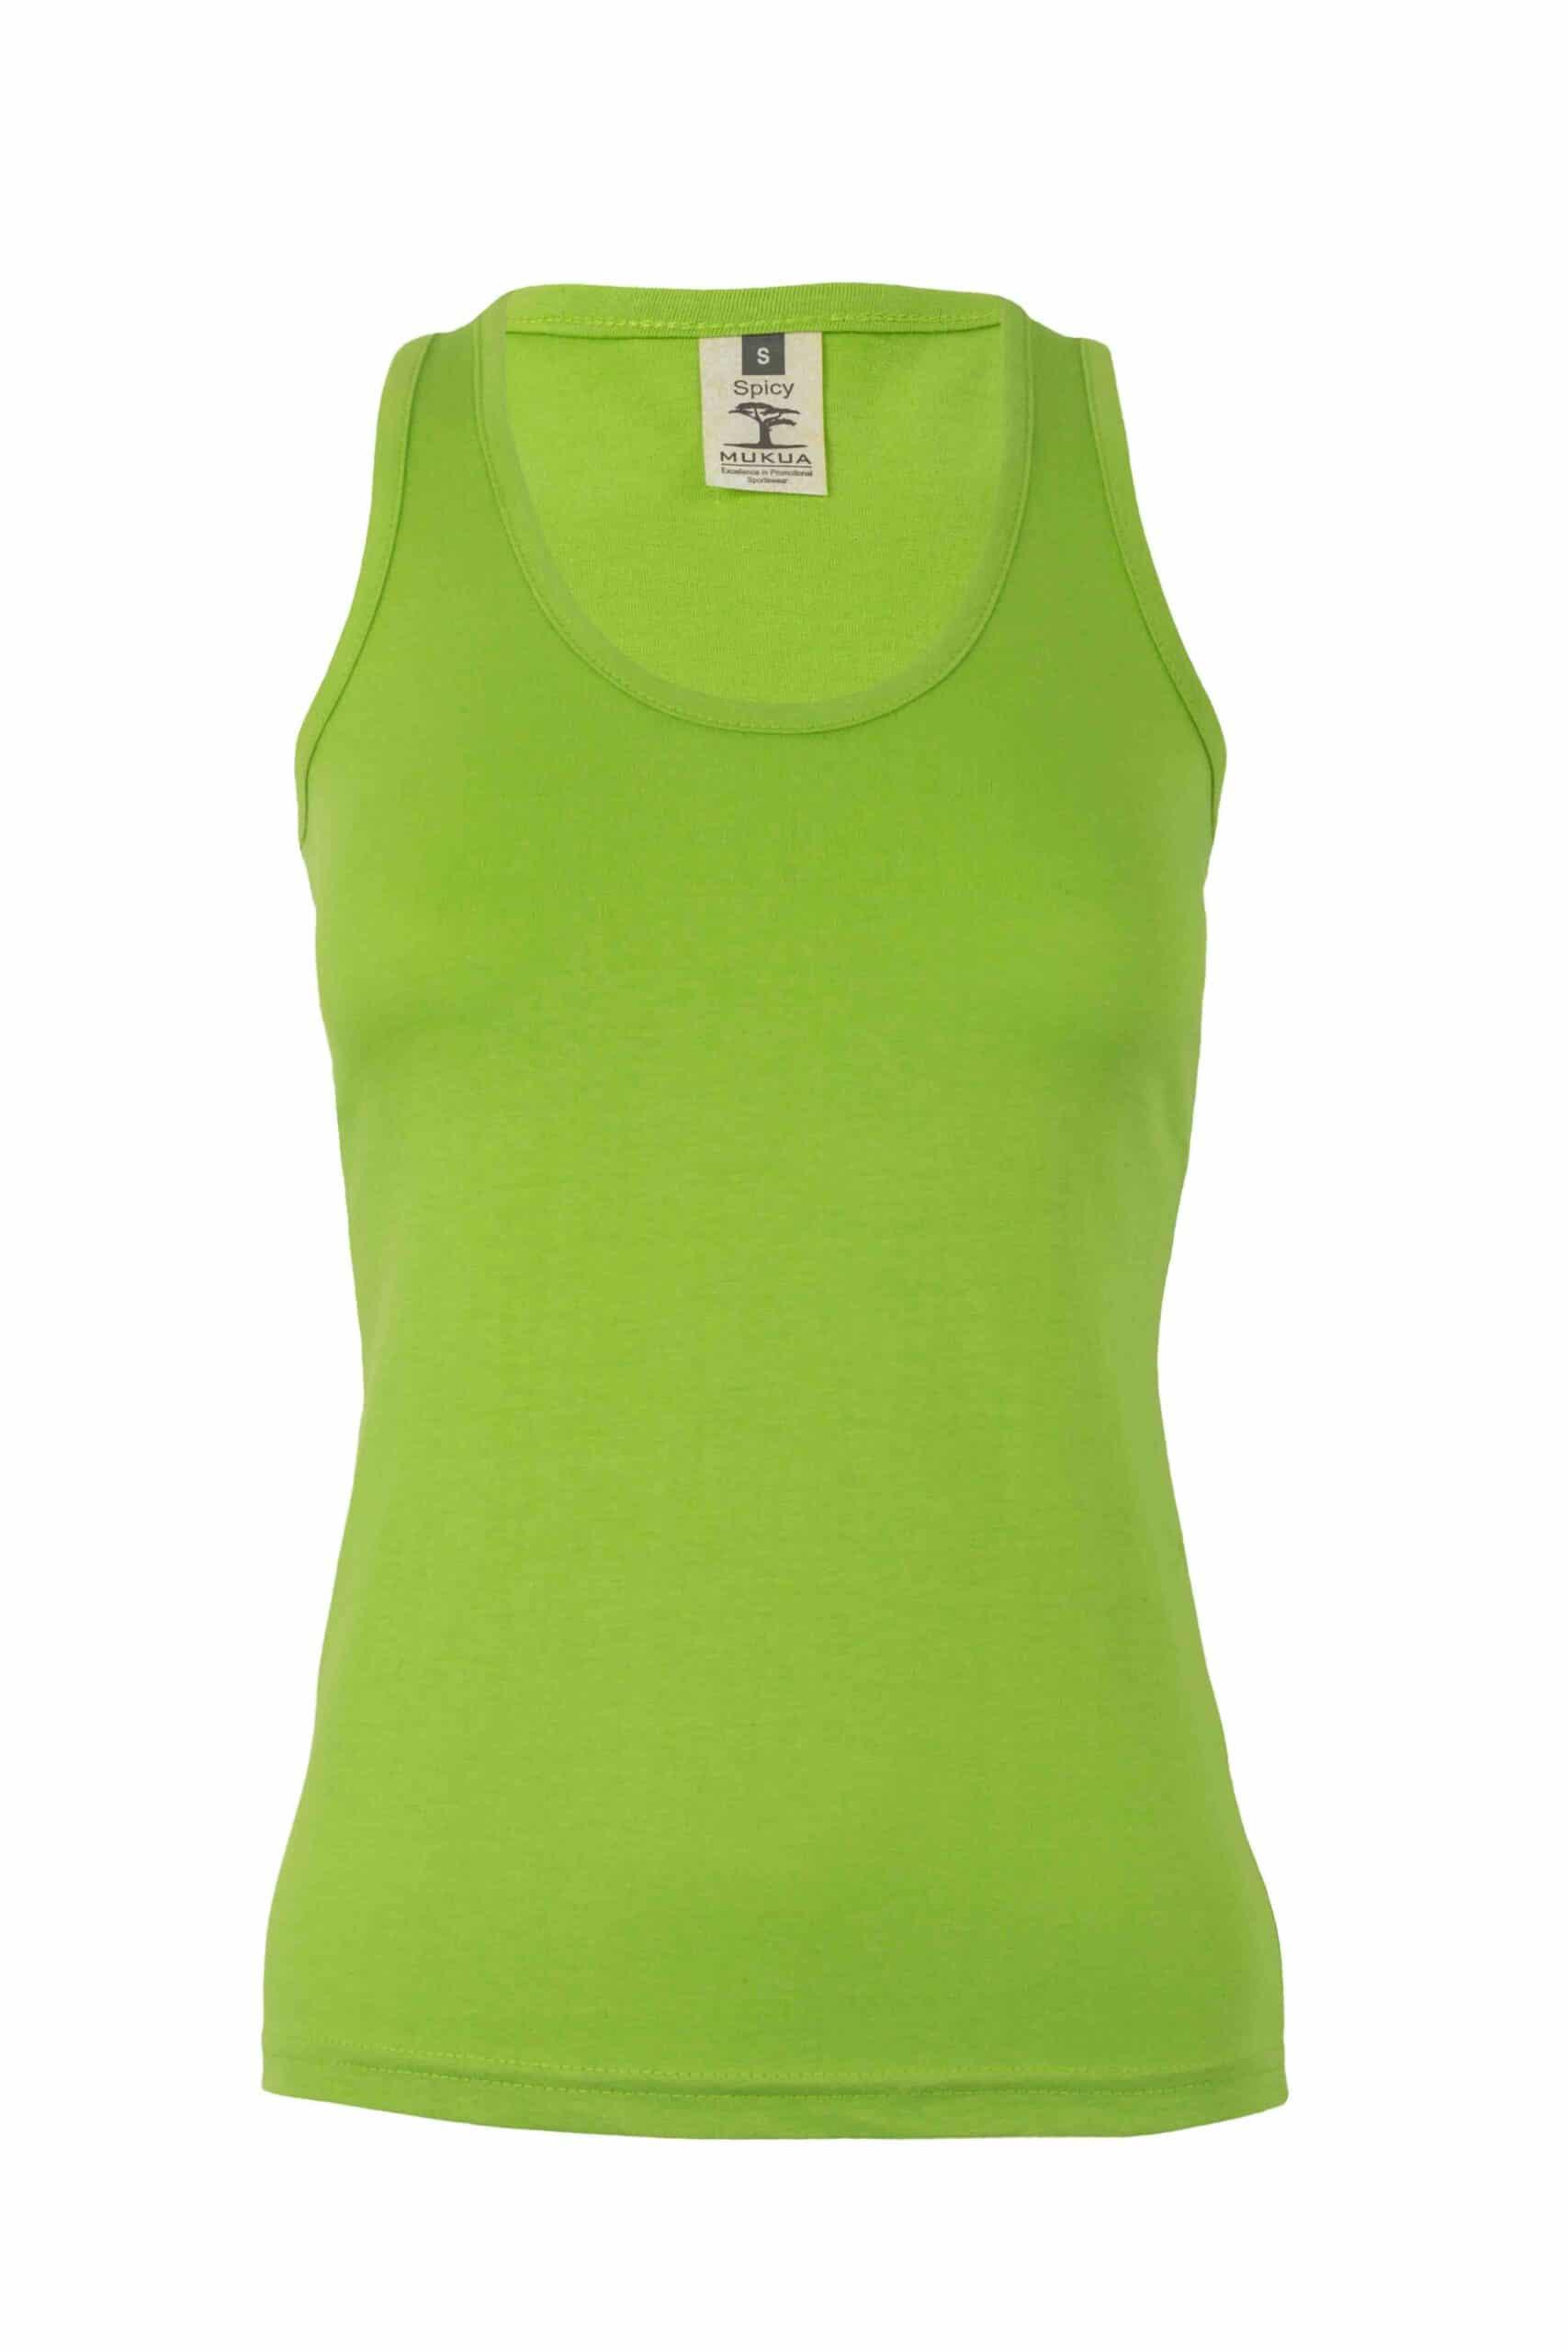 Mukua Mk171cv Camiseta Tirantes Mujer 150gr Lime